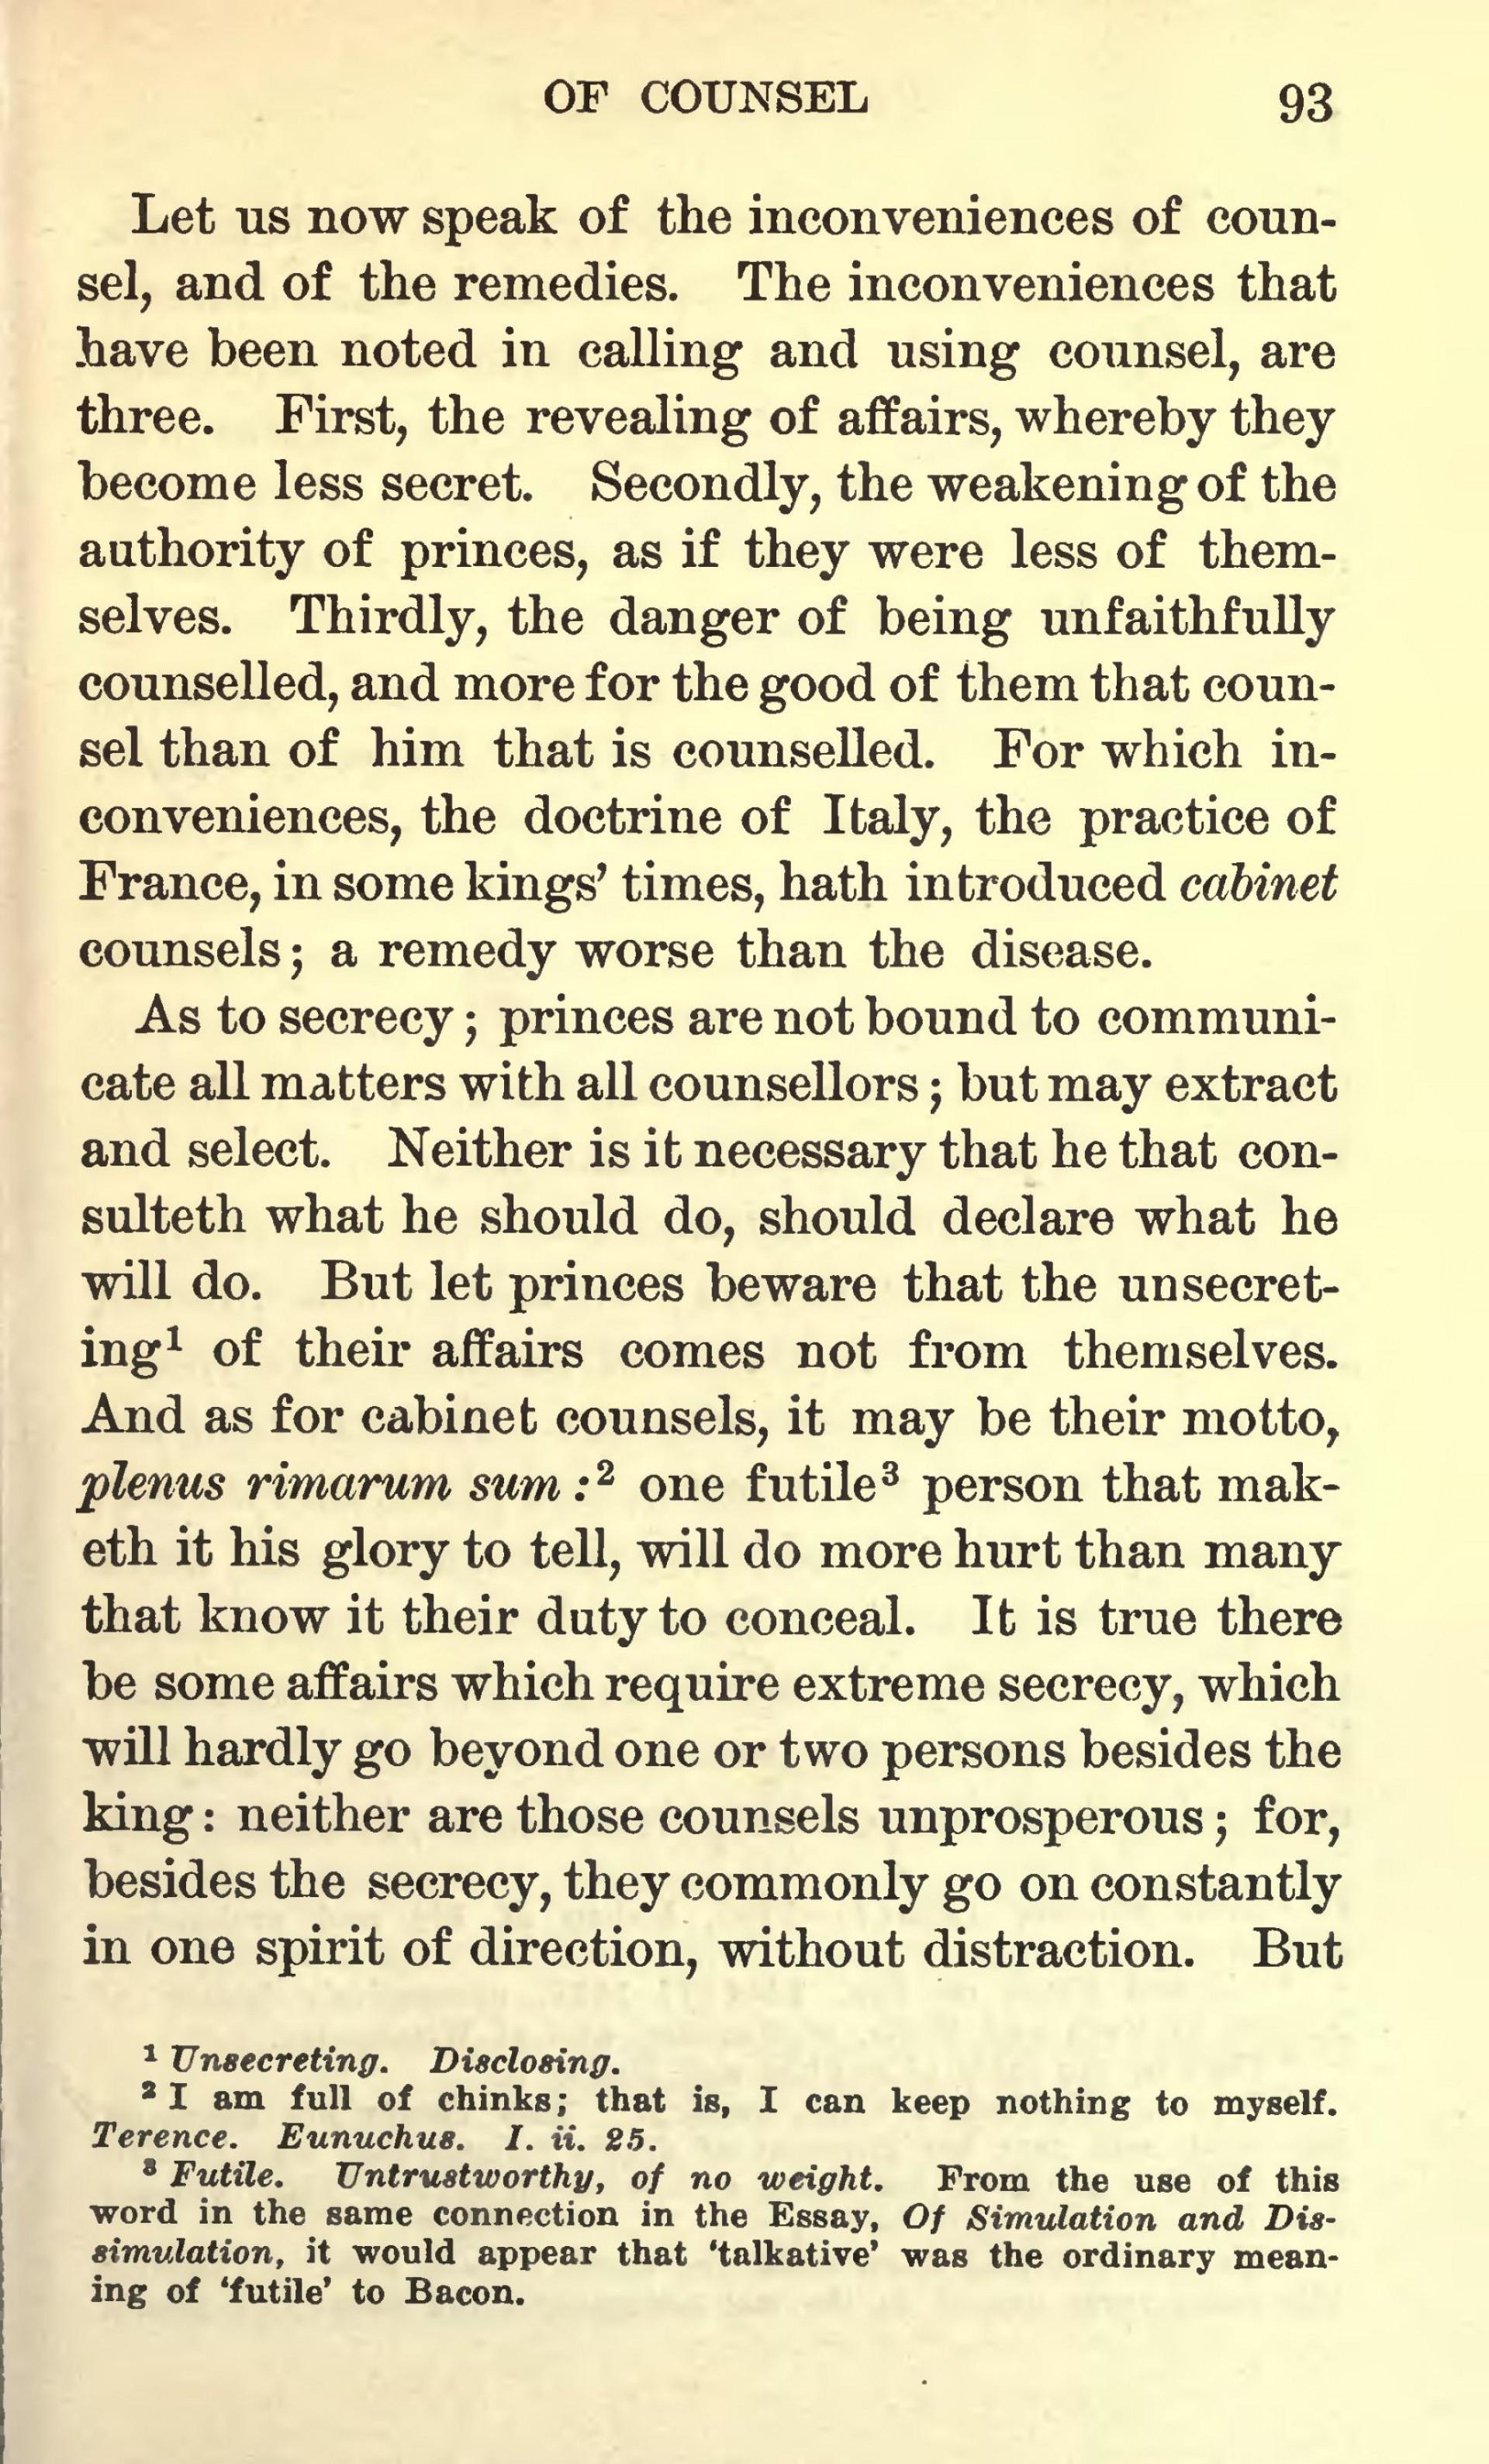 007 Page203 1728px Essays Of Francis Bacon 1908 Scott Djvu Bacons Essay Amazing Google Books Truth Quiz Bacon's Summary 1920